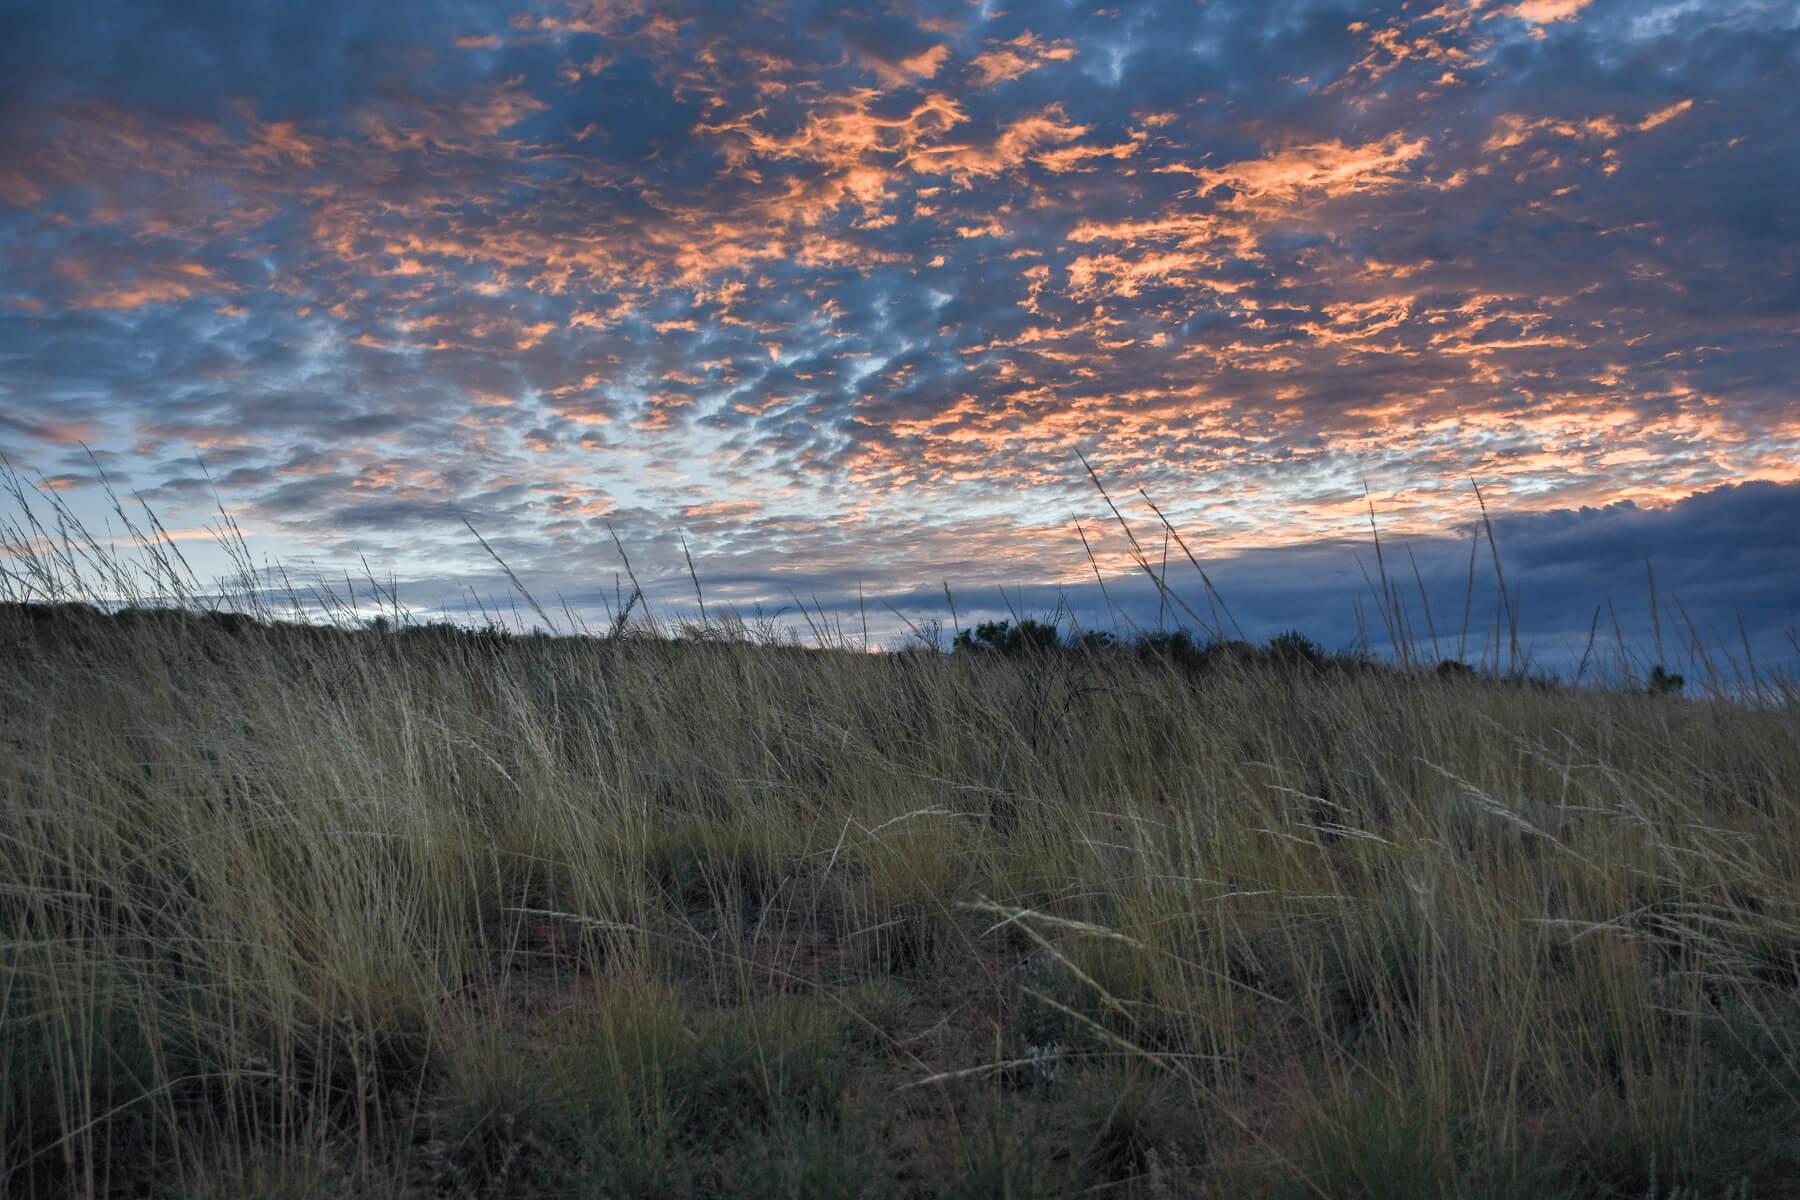 Blue/Orange Sunrise Sky over Spinifex Grass